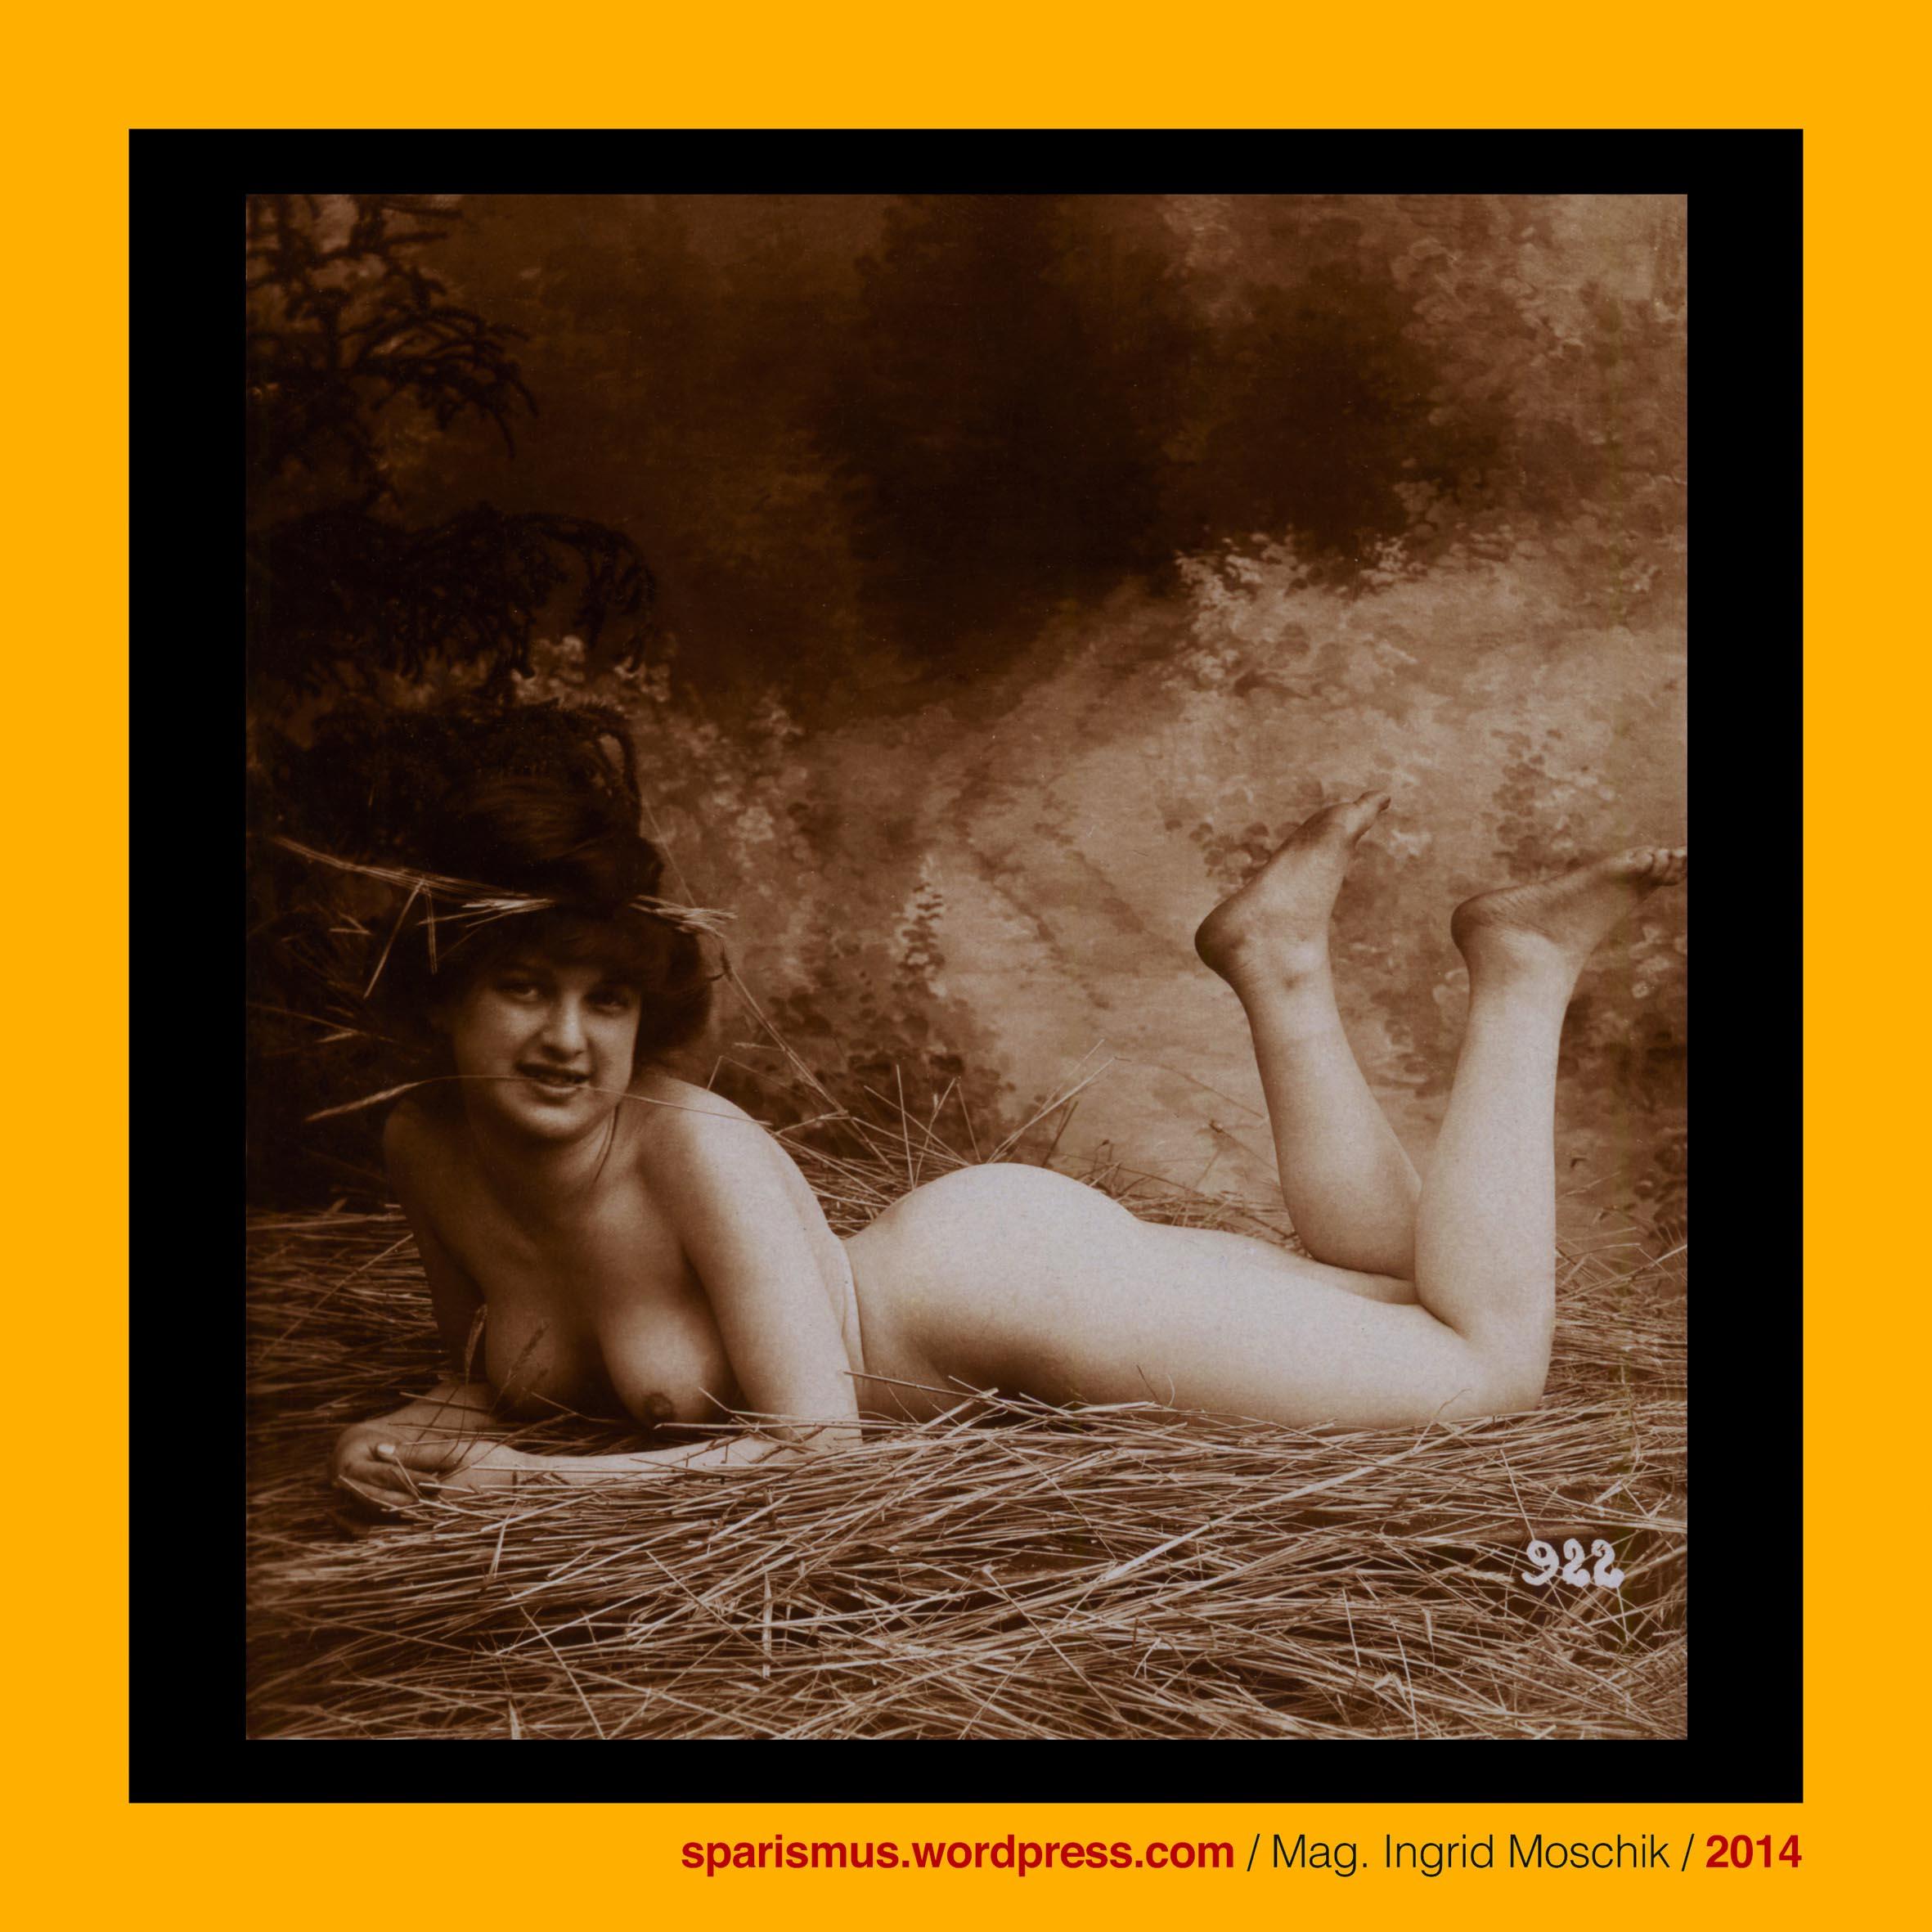 erotische foto posen graz umgebung